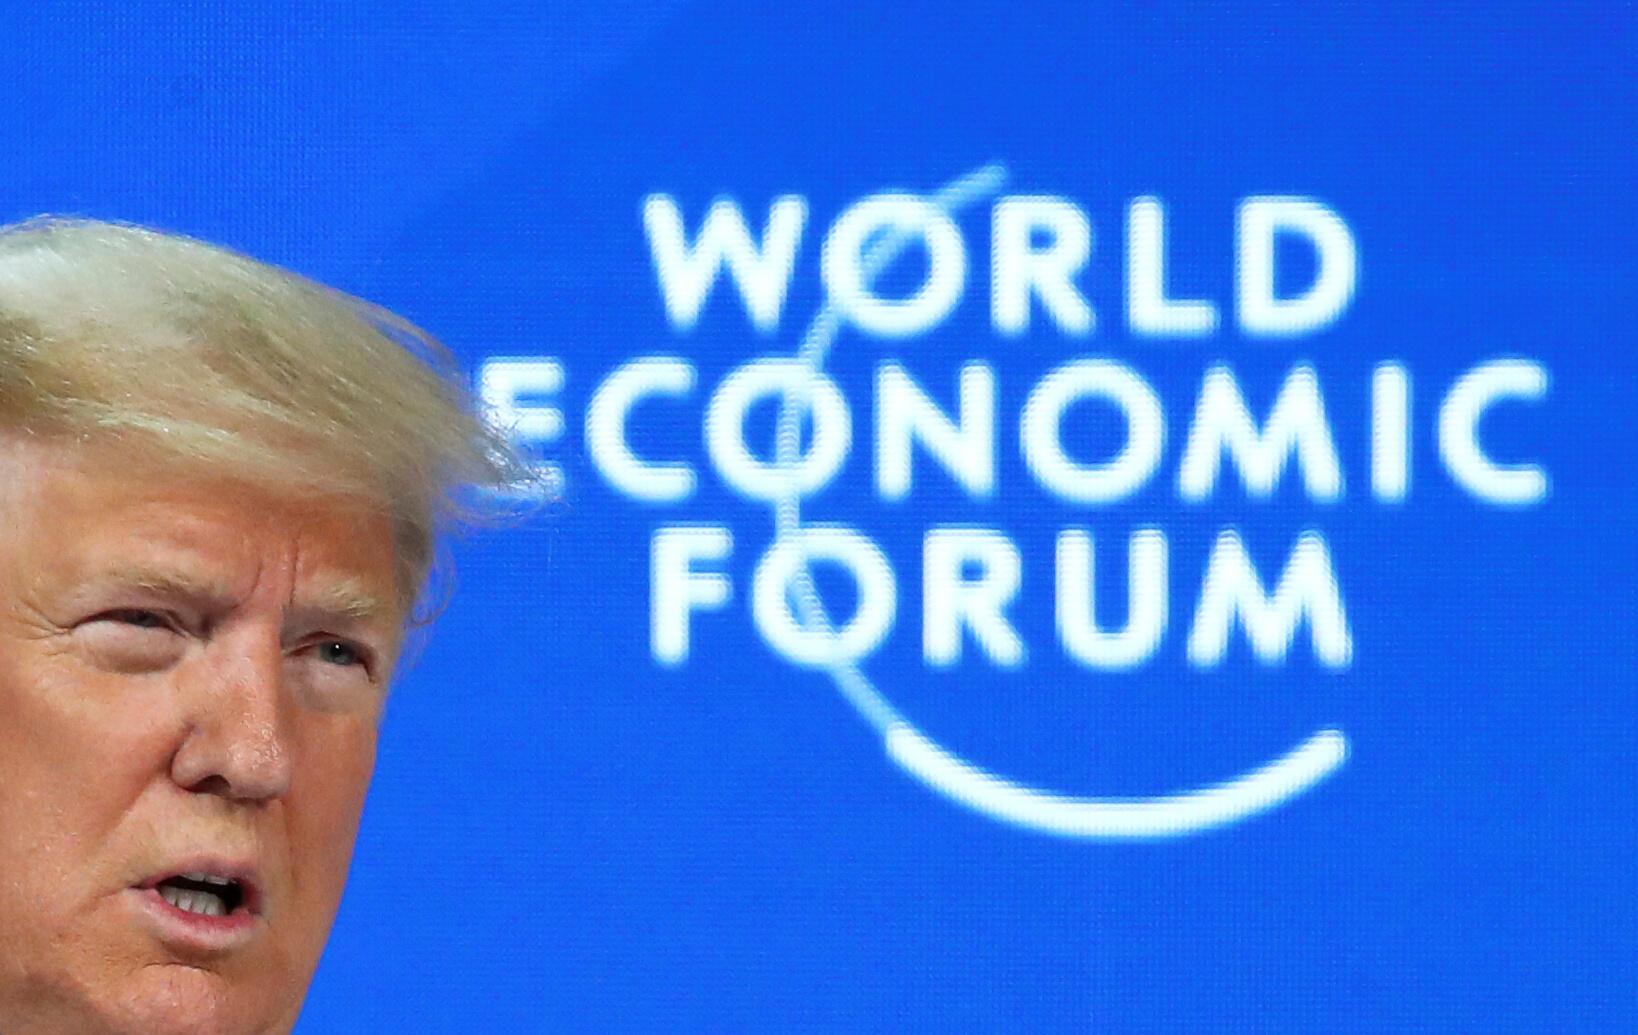 Trump discurso no forum económico mundial de Davos 2020 sobre sucesso da economia americana